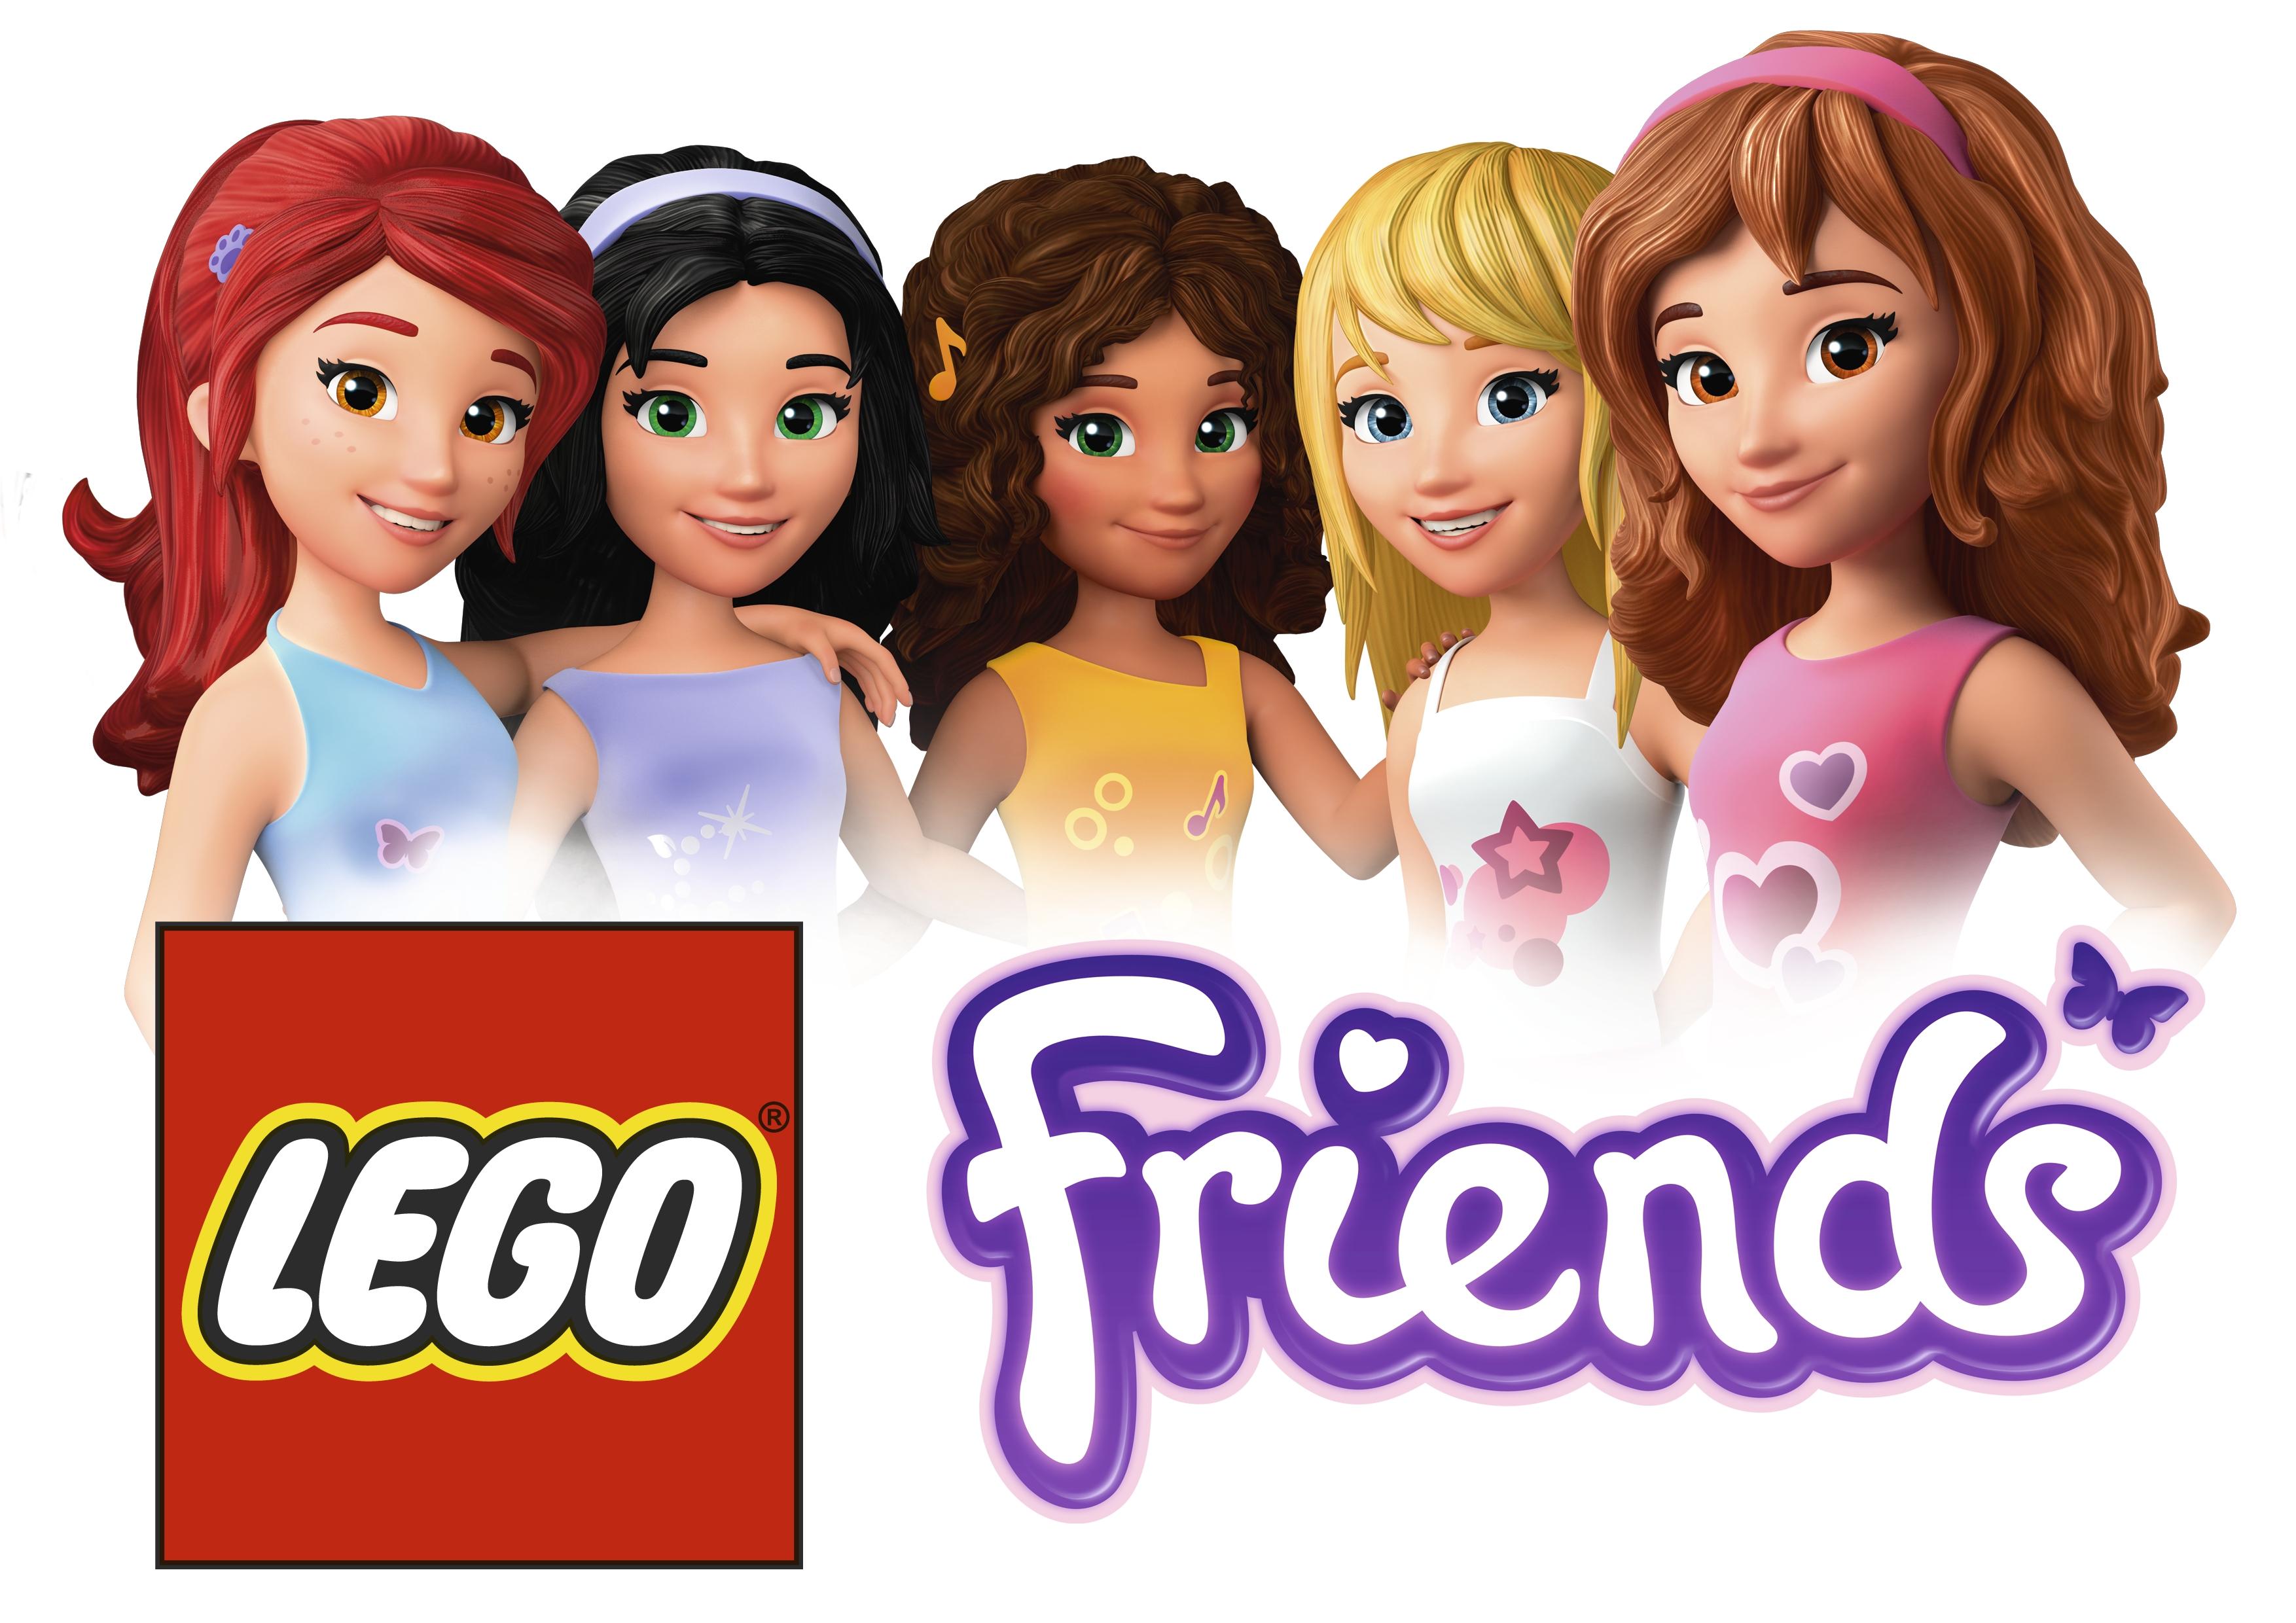 Картинки лего френдс для девочек - e